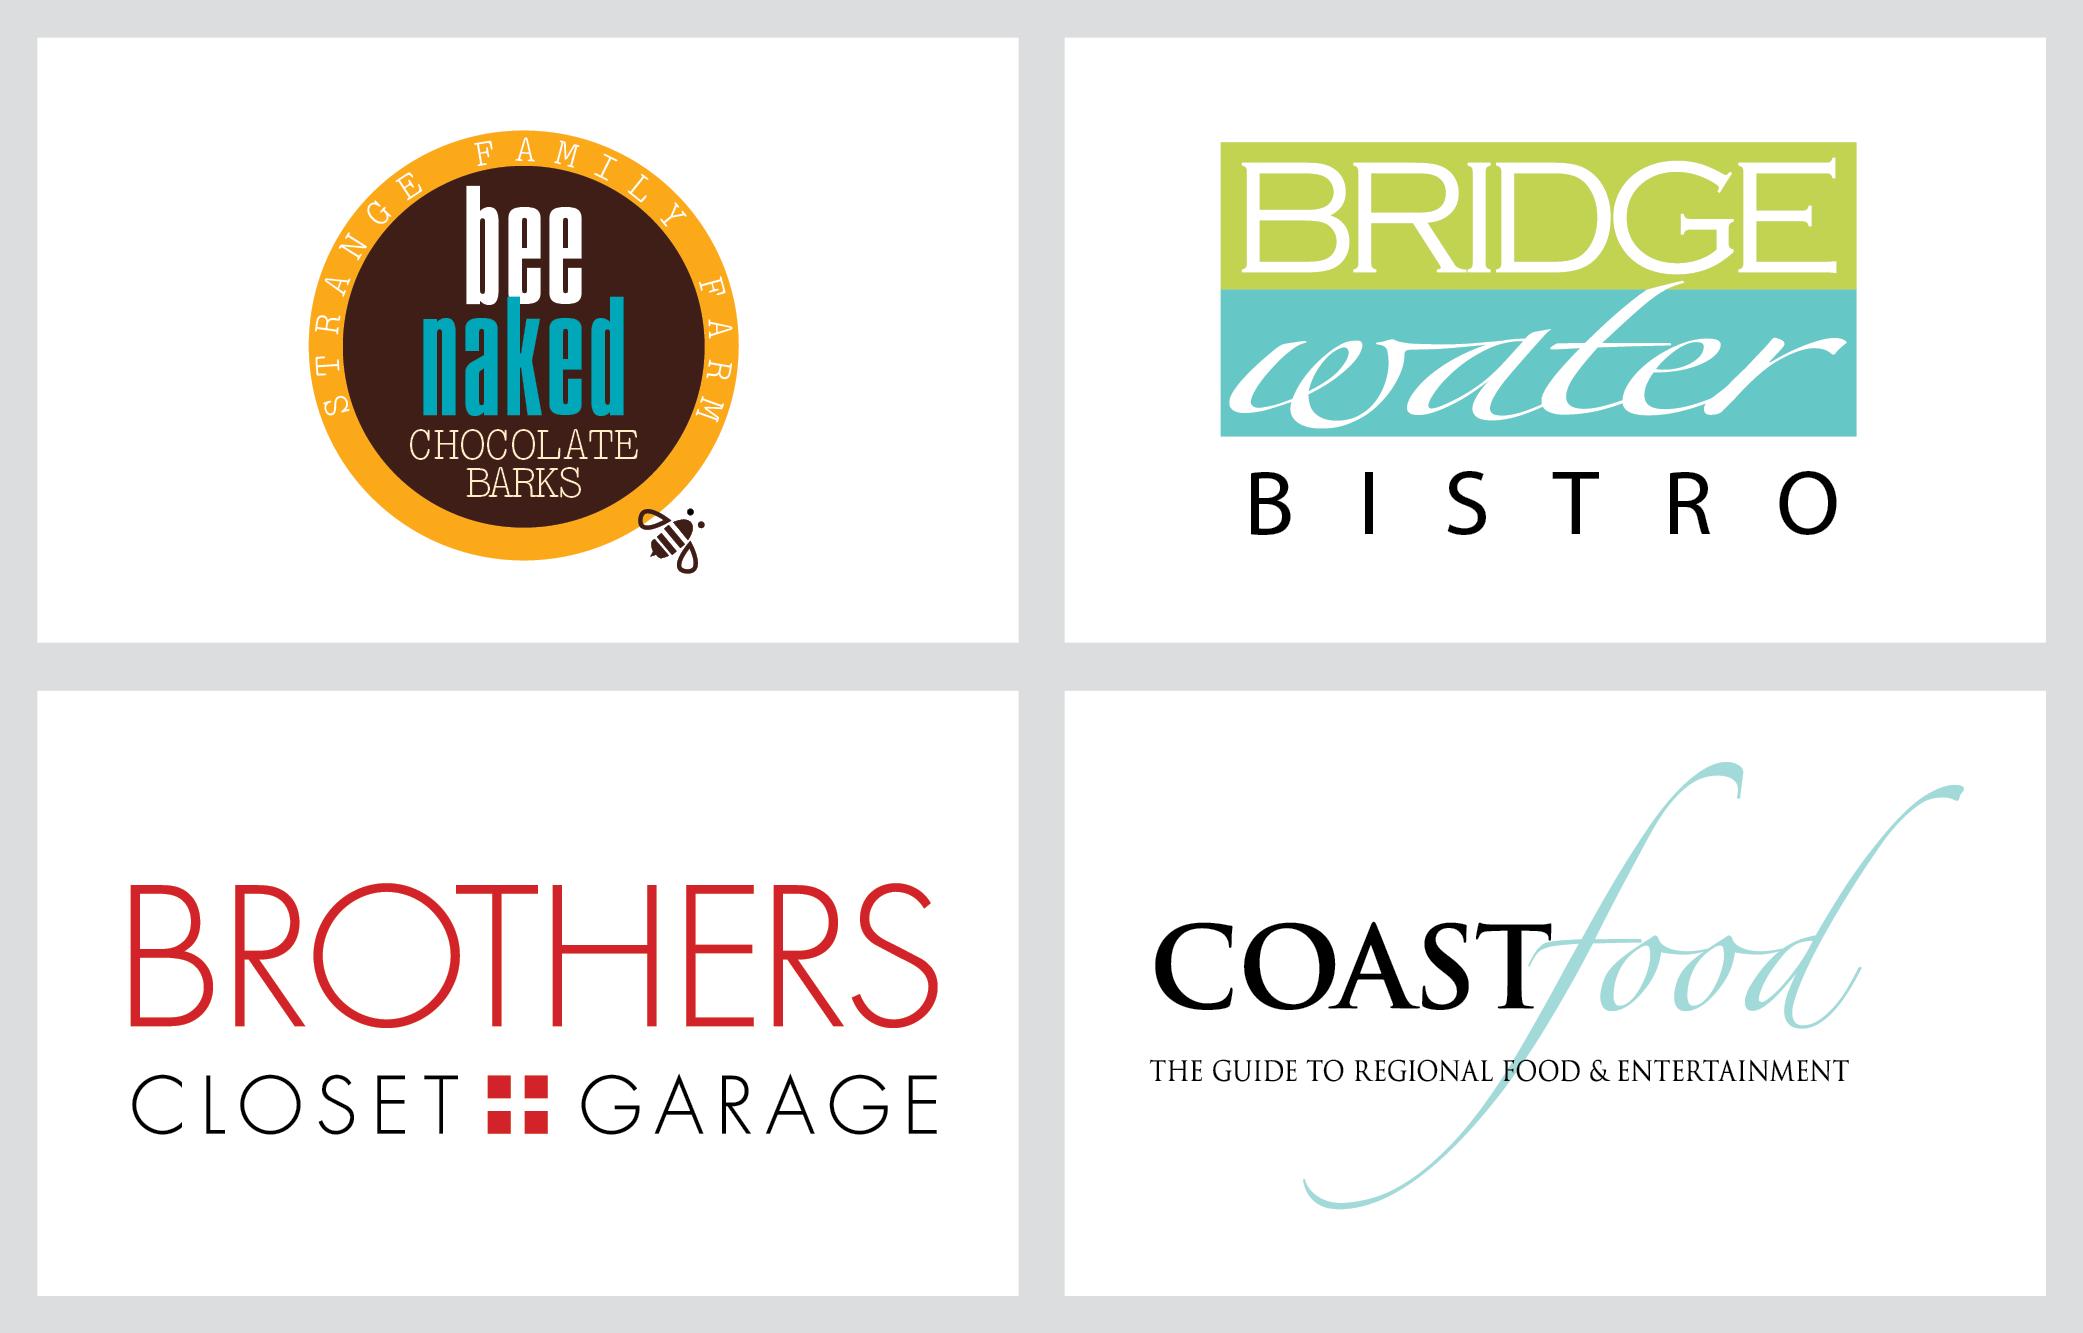 bridge water bistro, coast food logos